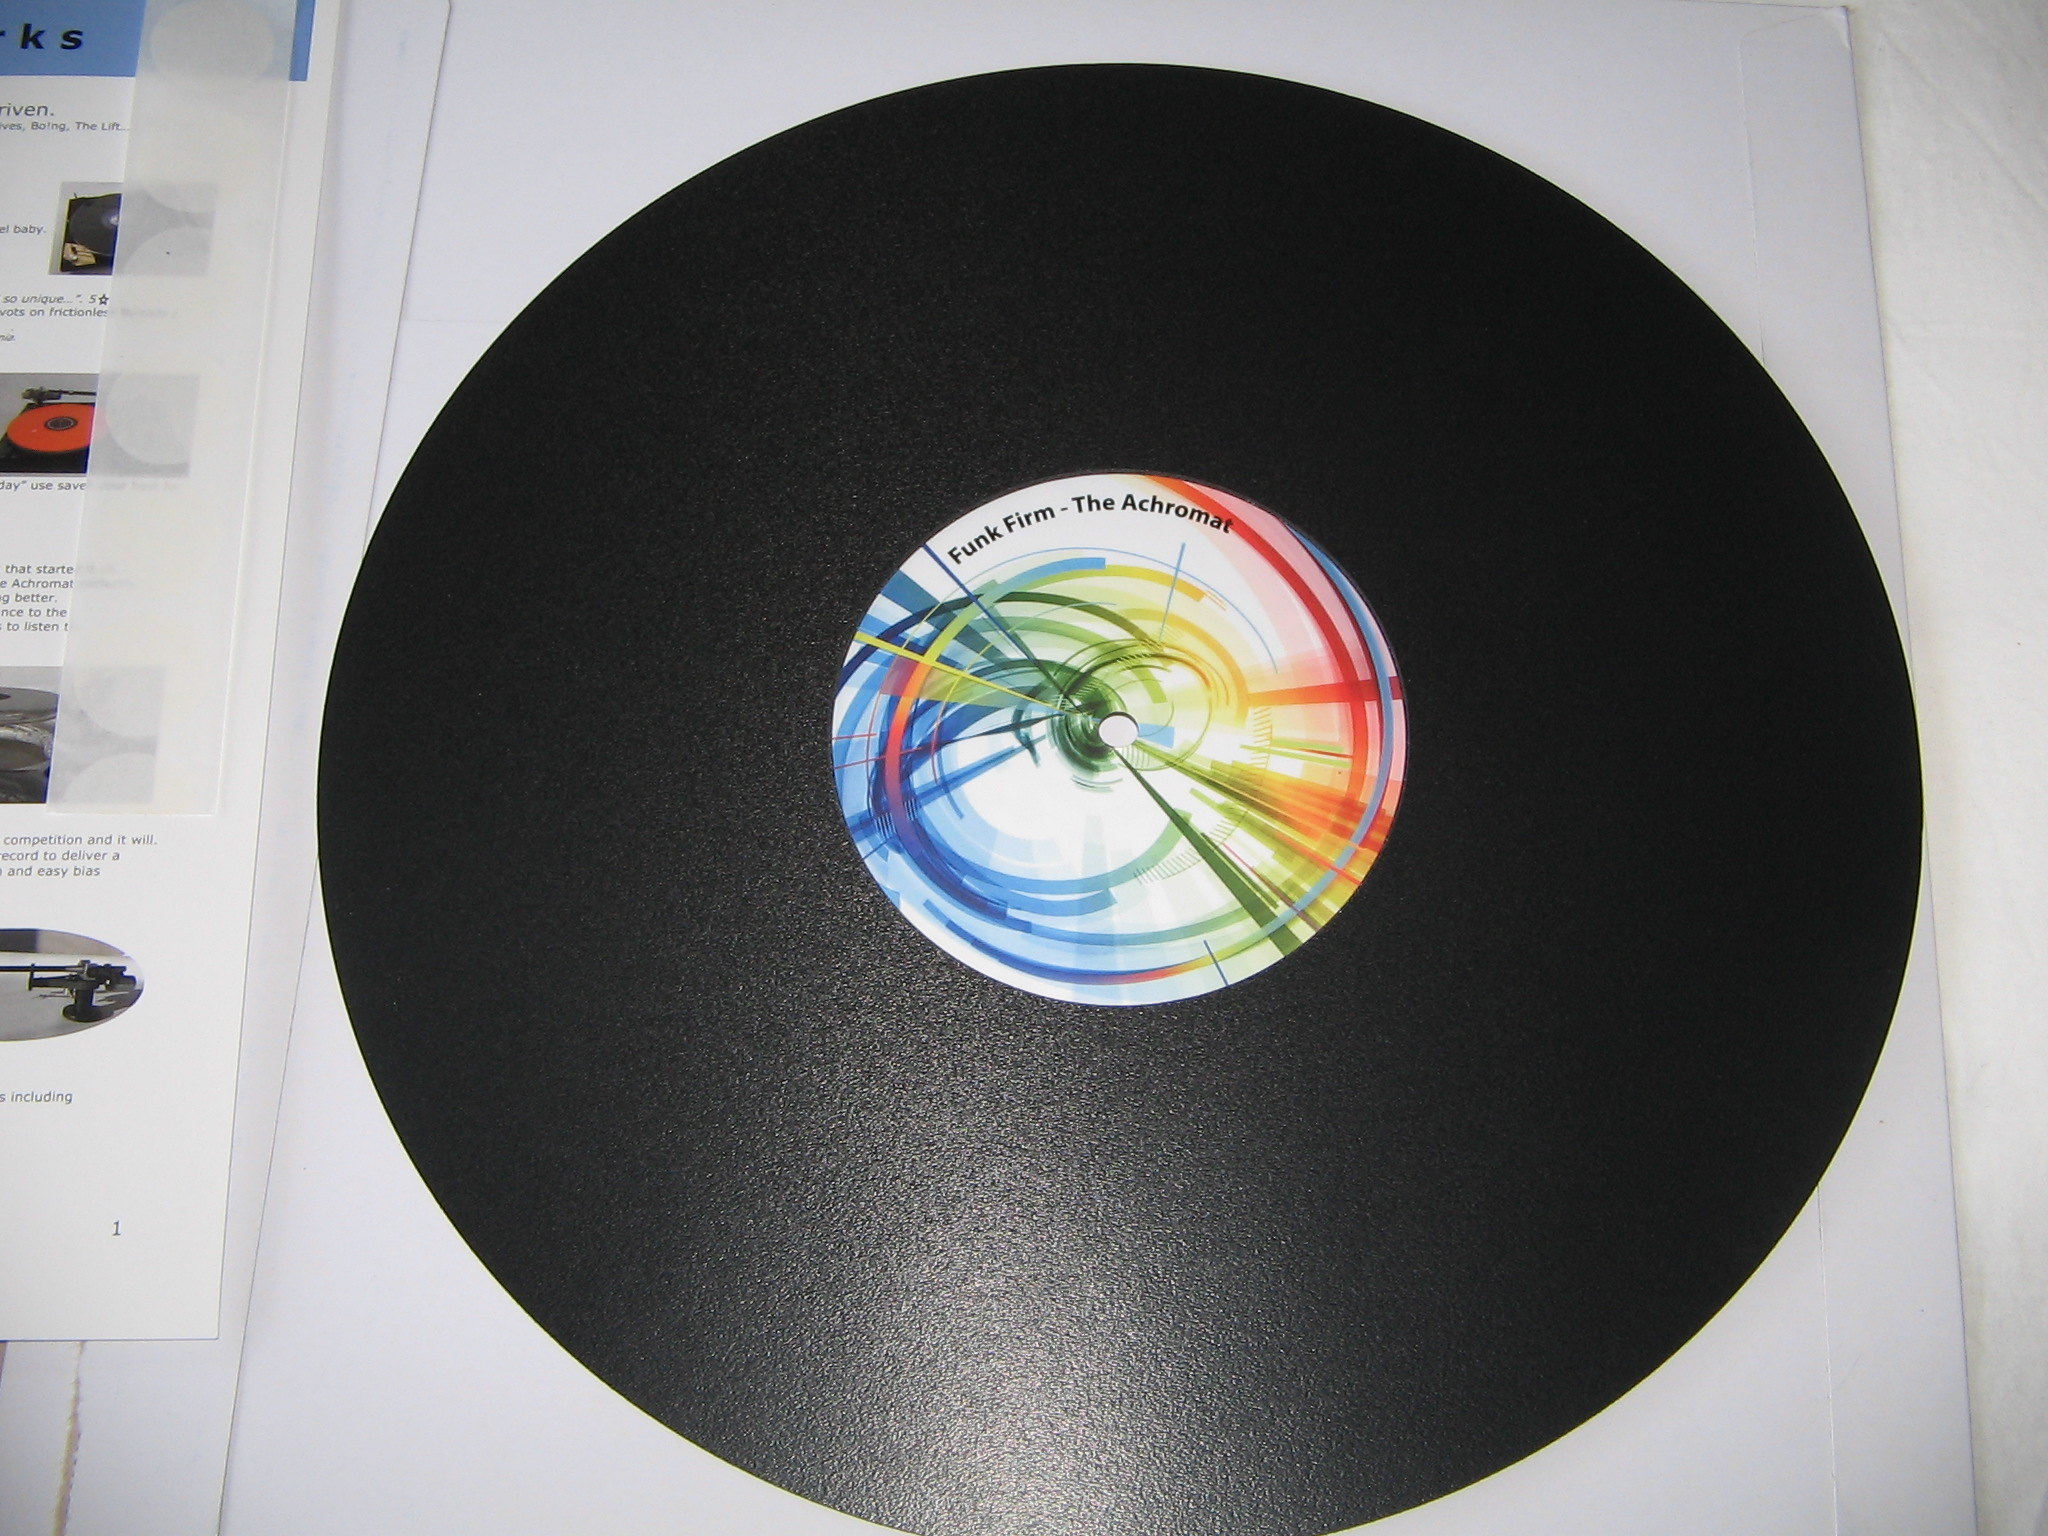 Fs Funk Firm Achromat Turntable Platter Mat 3 0mm